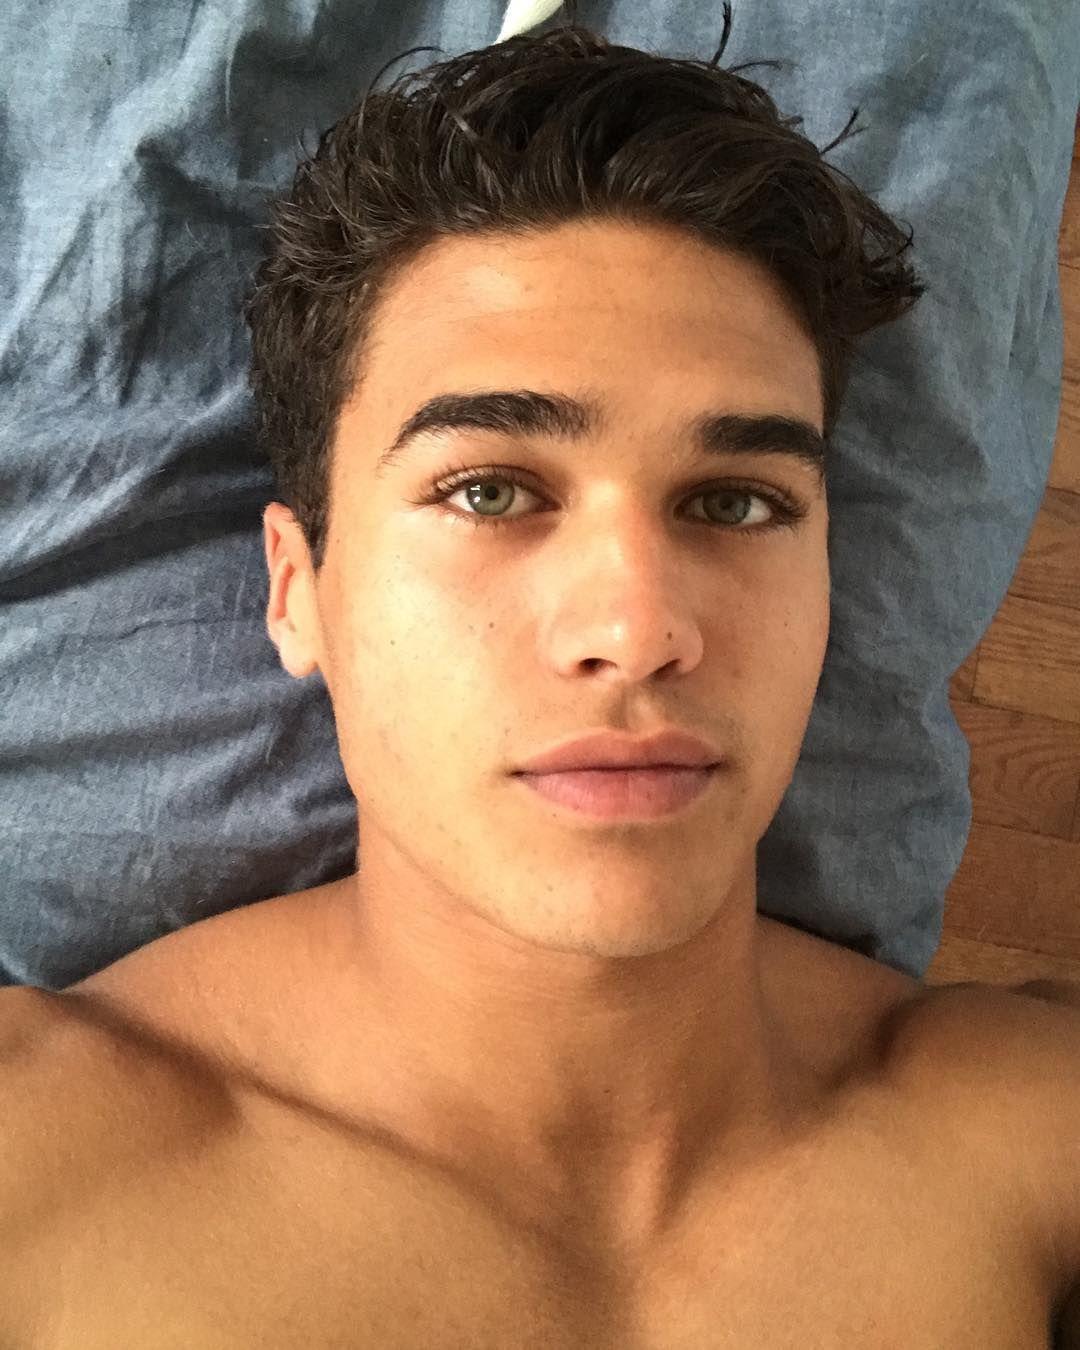 White Boy Swag On Tumblr: H RAFTUS On Instagram Eye Candy In 2019 Hot Boys Hot